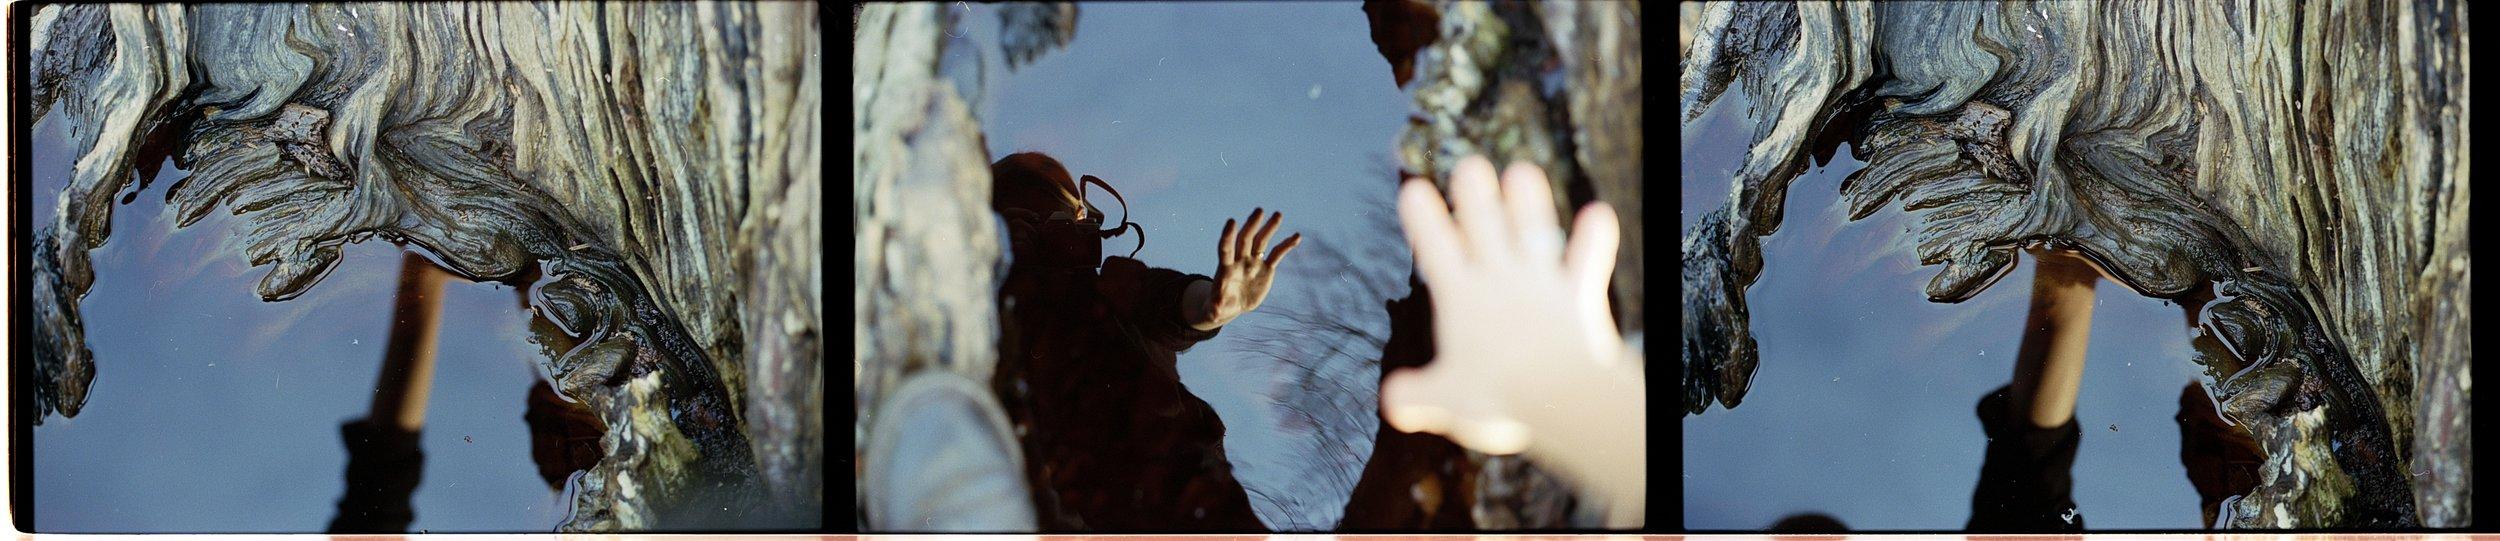 Samana, Samana music, Rebecca Rose Harris Photography, Analogue Photography, Death